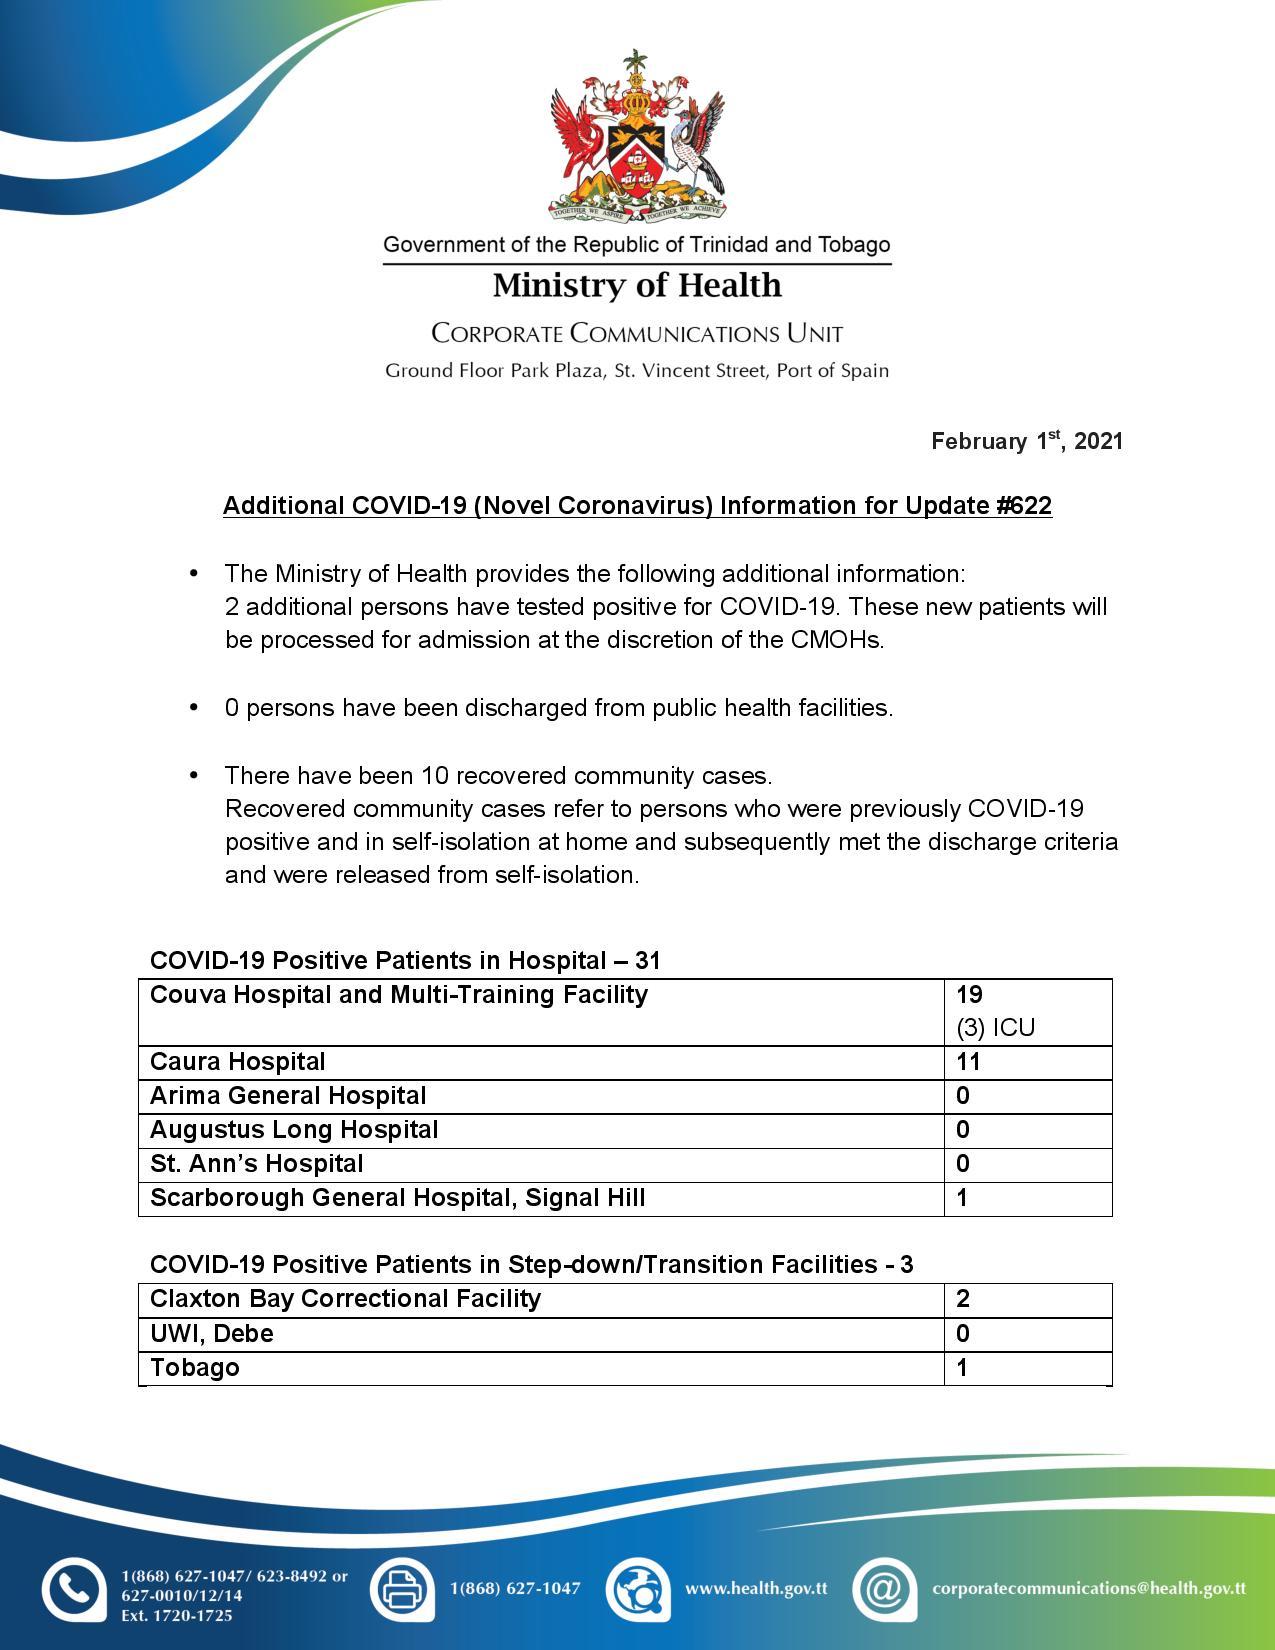 COVID-19 UPDATE - Monday 1st February 2021 Additional